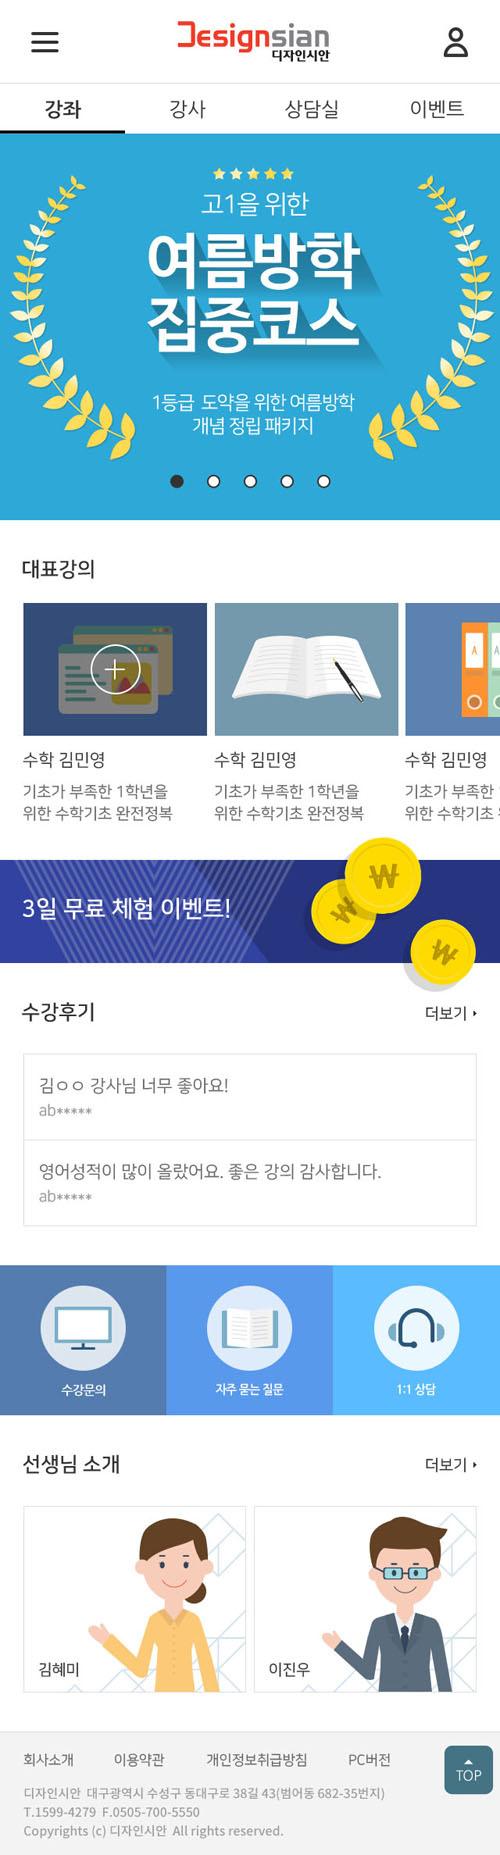 MOBILE - 시안번호 20368116